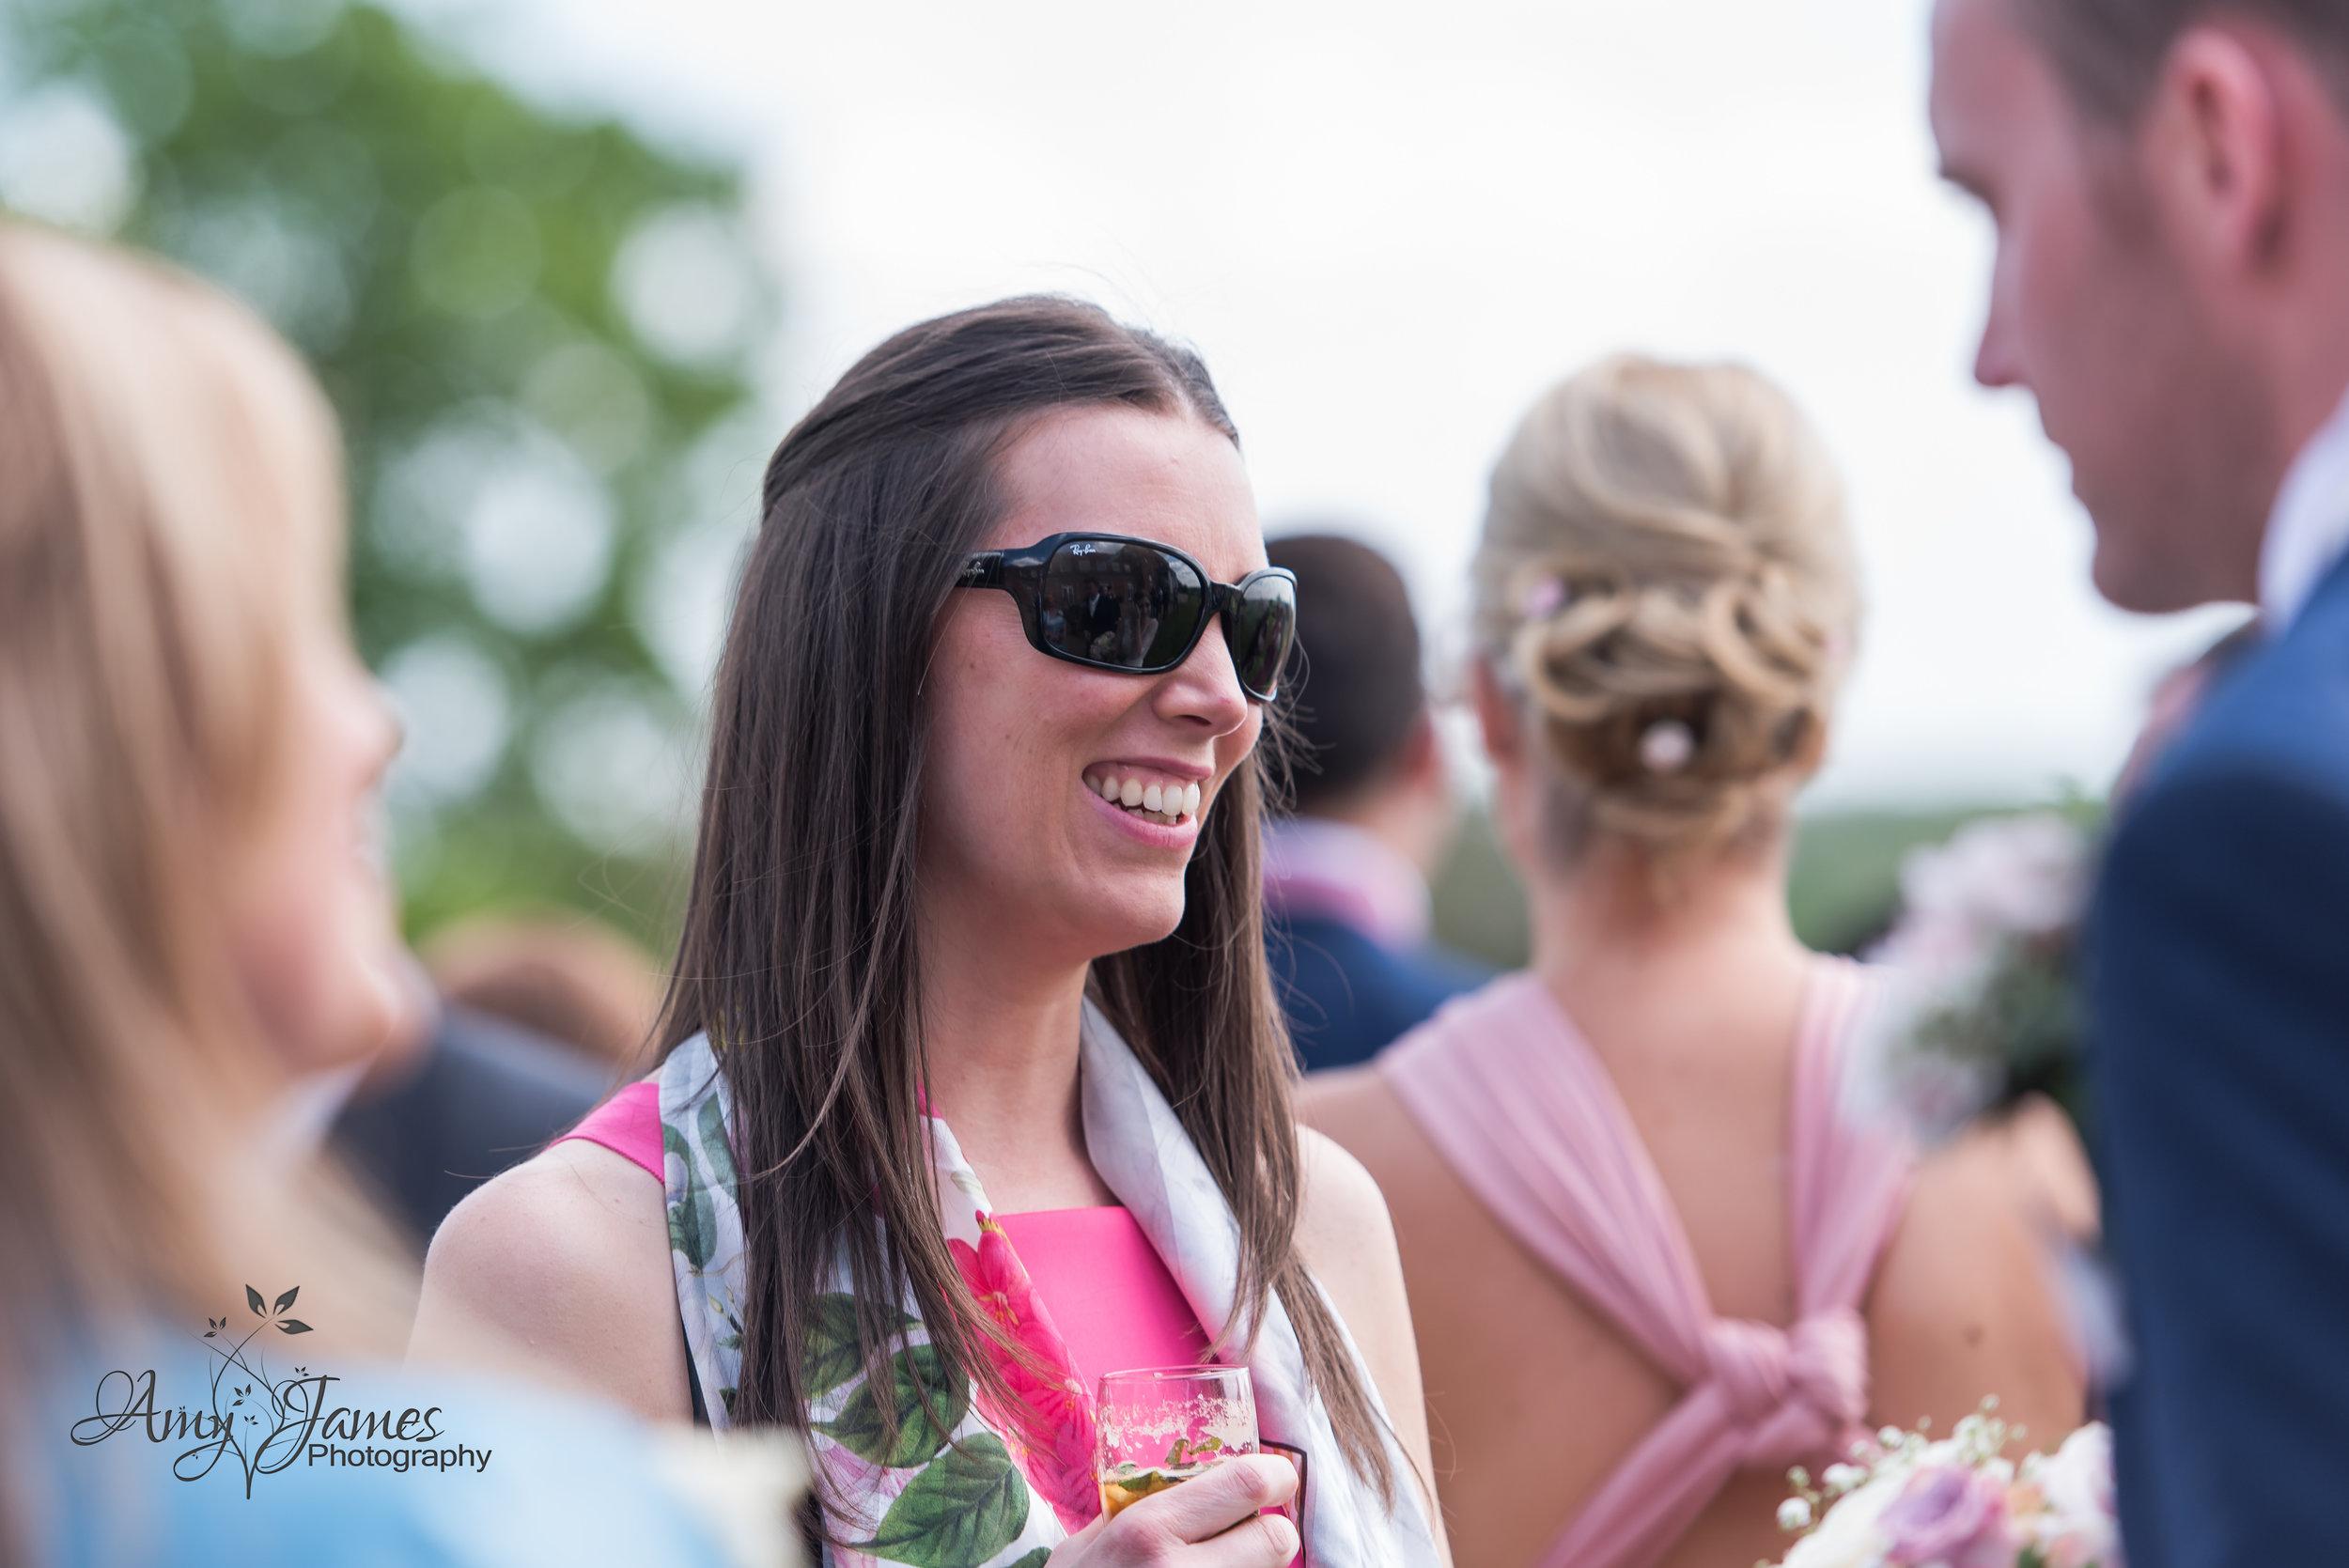 Highfield PArk Wedding Photographer | Hampshire Wedding Photographer | Fleet wedding photographer | AMy James Photography | Uk outdoor wedding venue